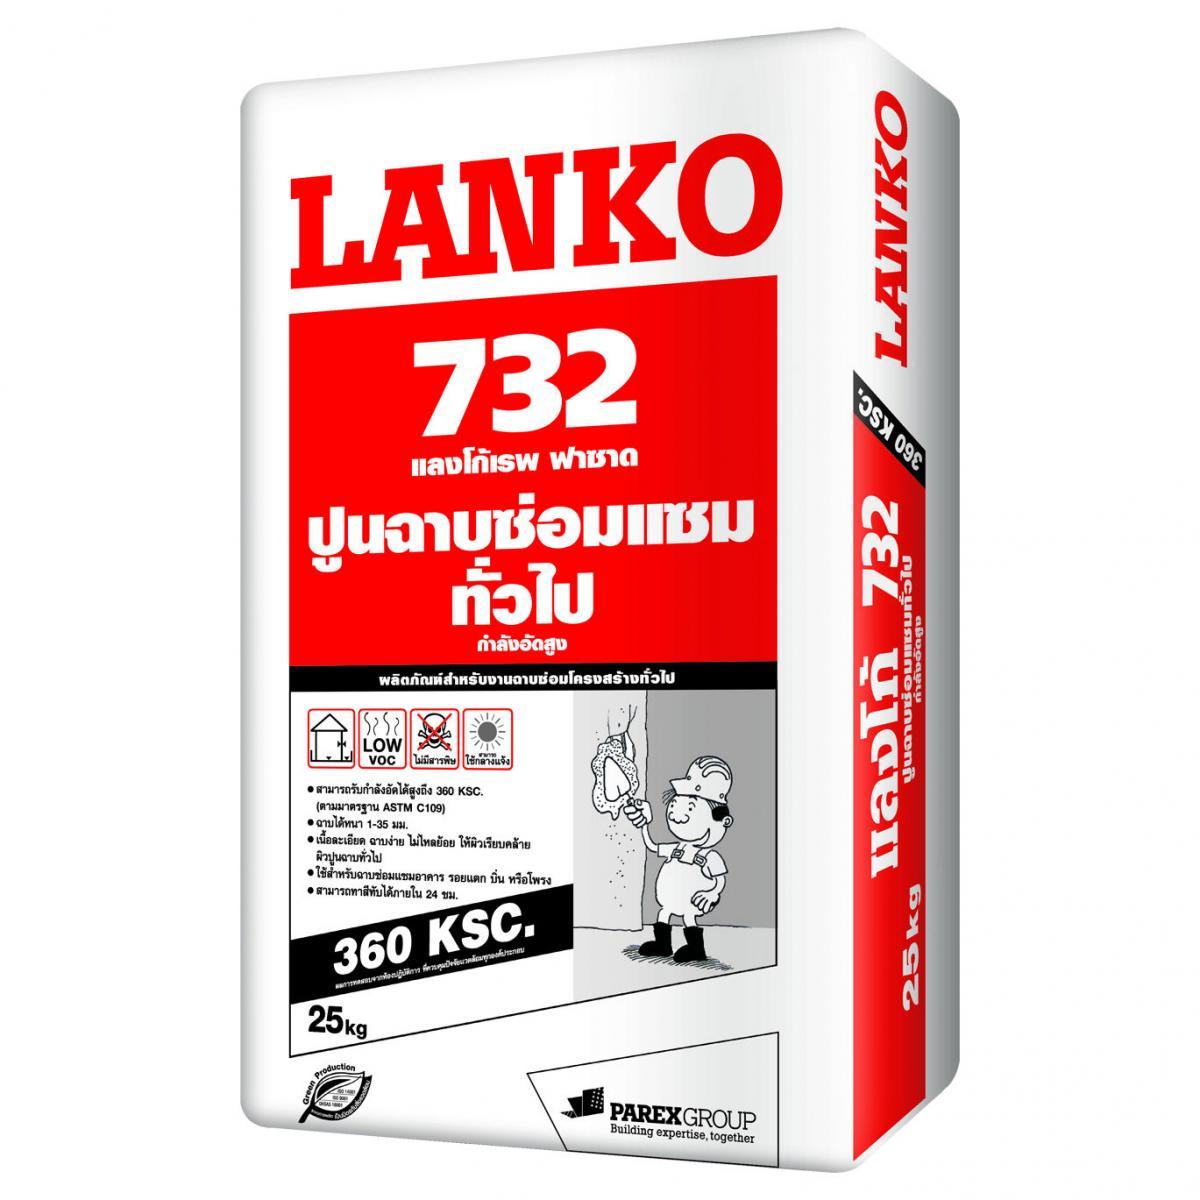 Lanko 732, 25 kg/bag